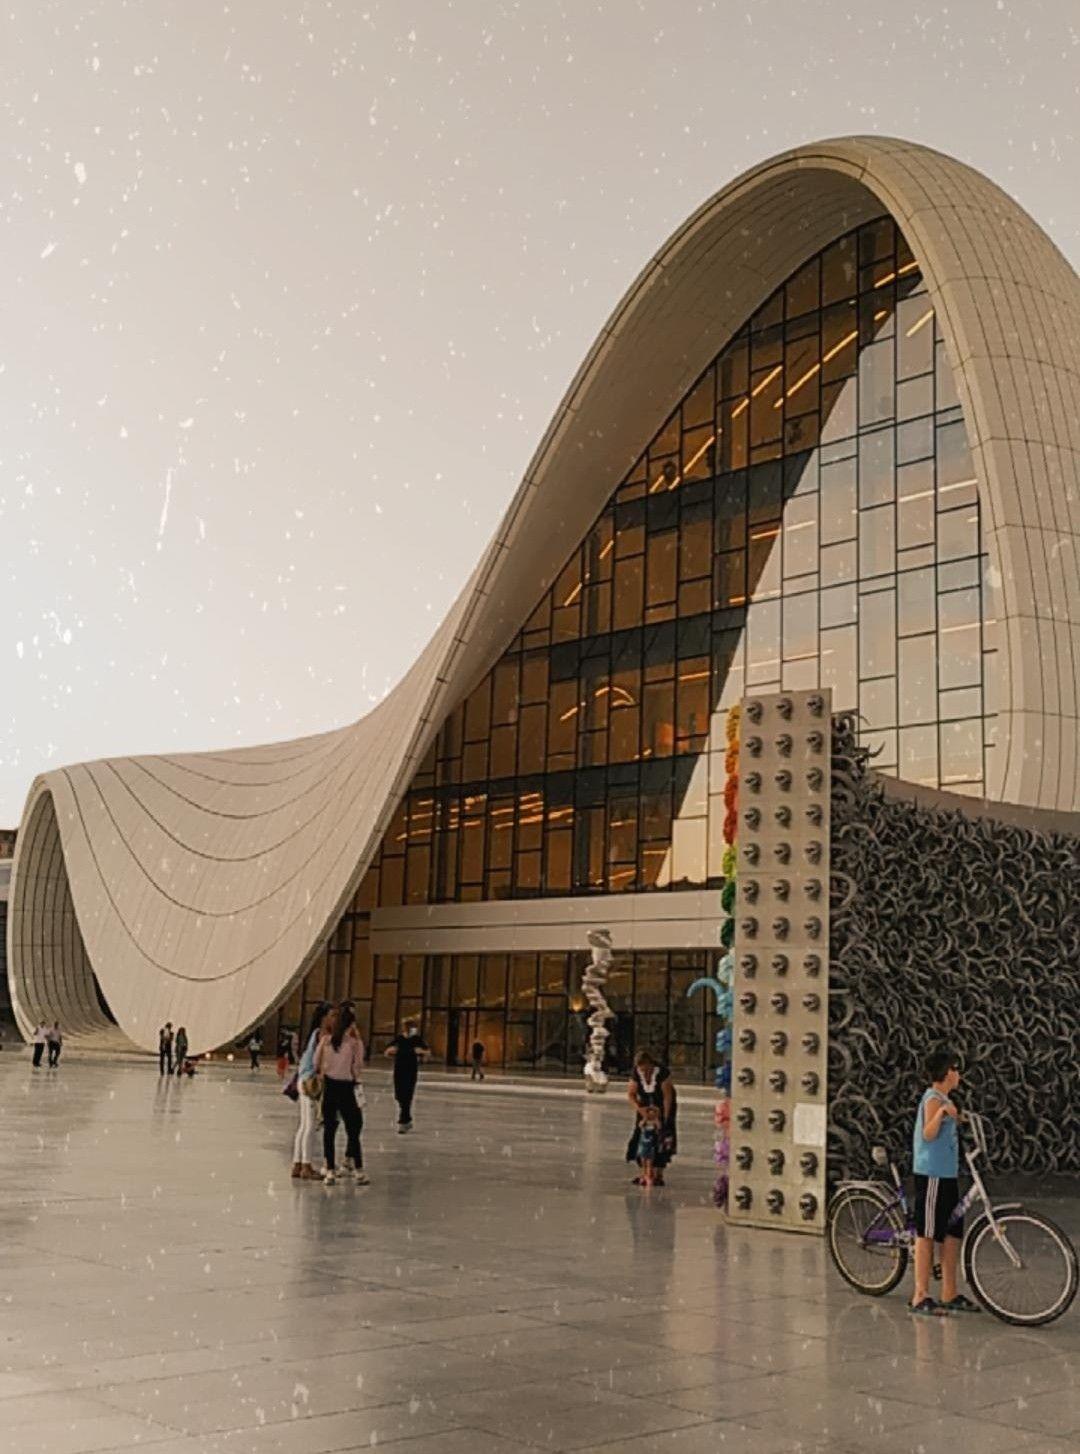 Haydar Aliev Center In 2020 Azerbaijan Baku Azerbaijan Baku